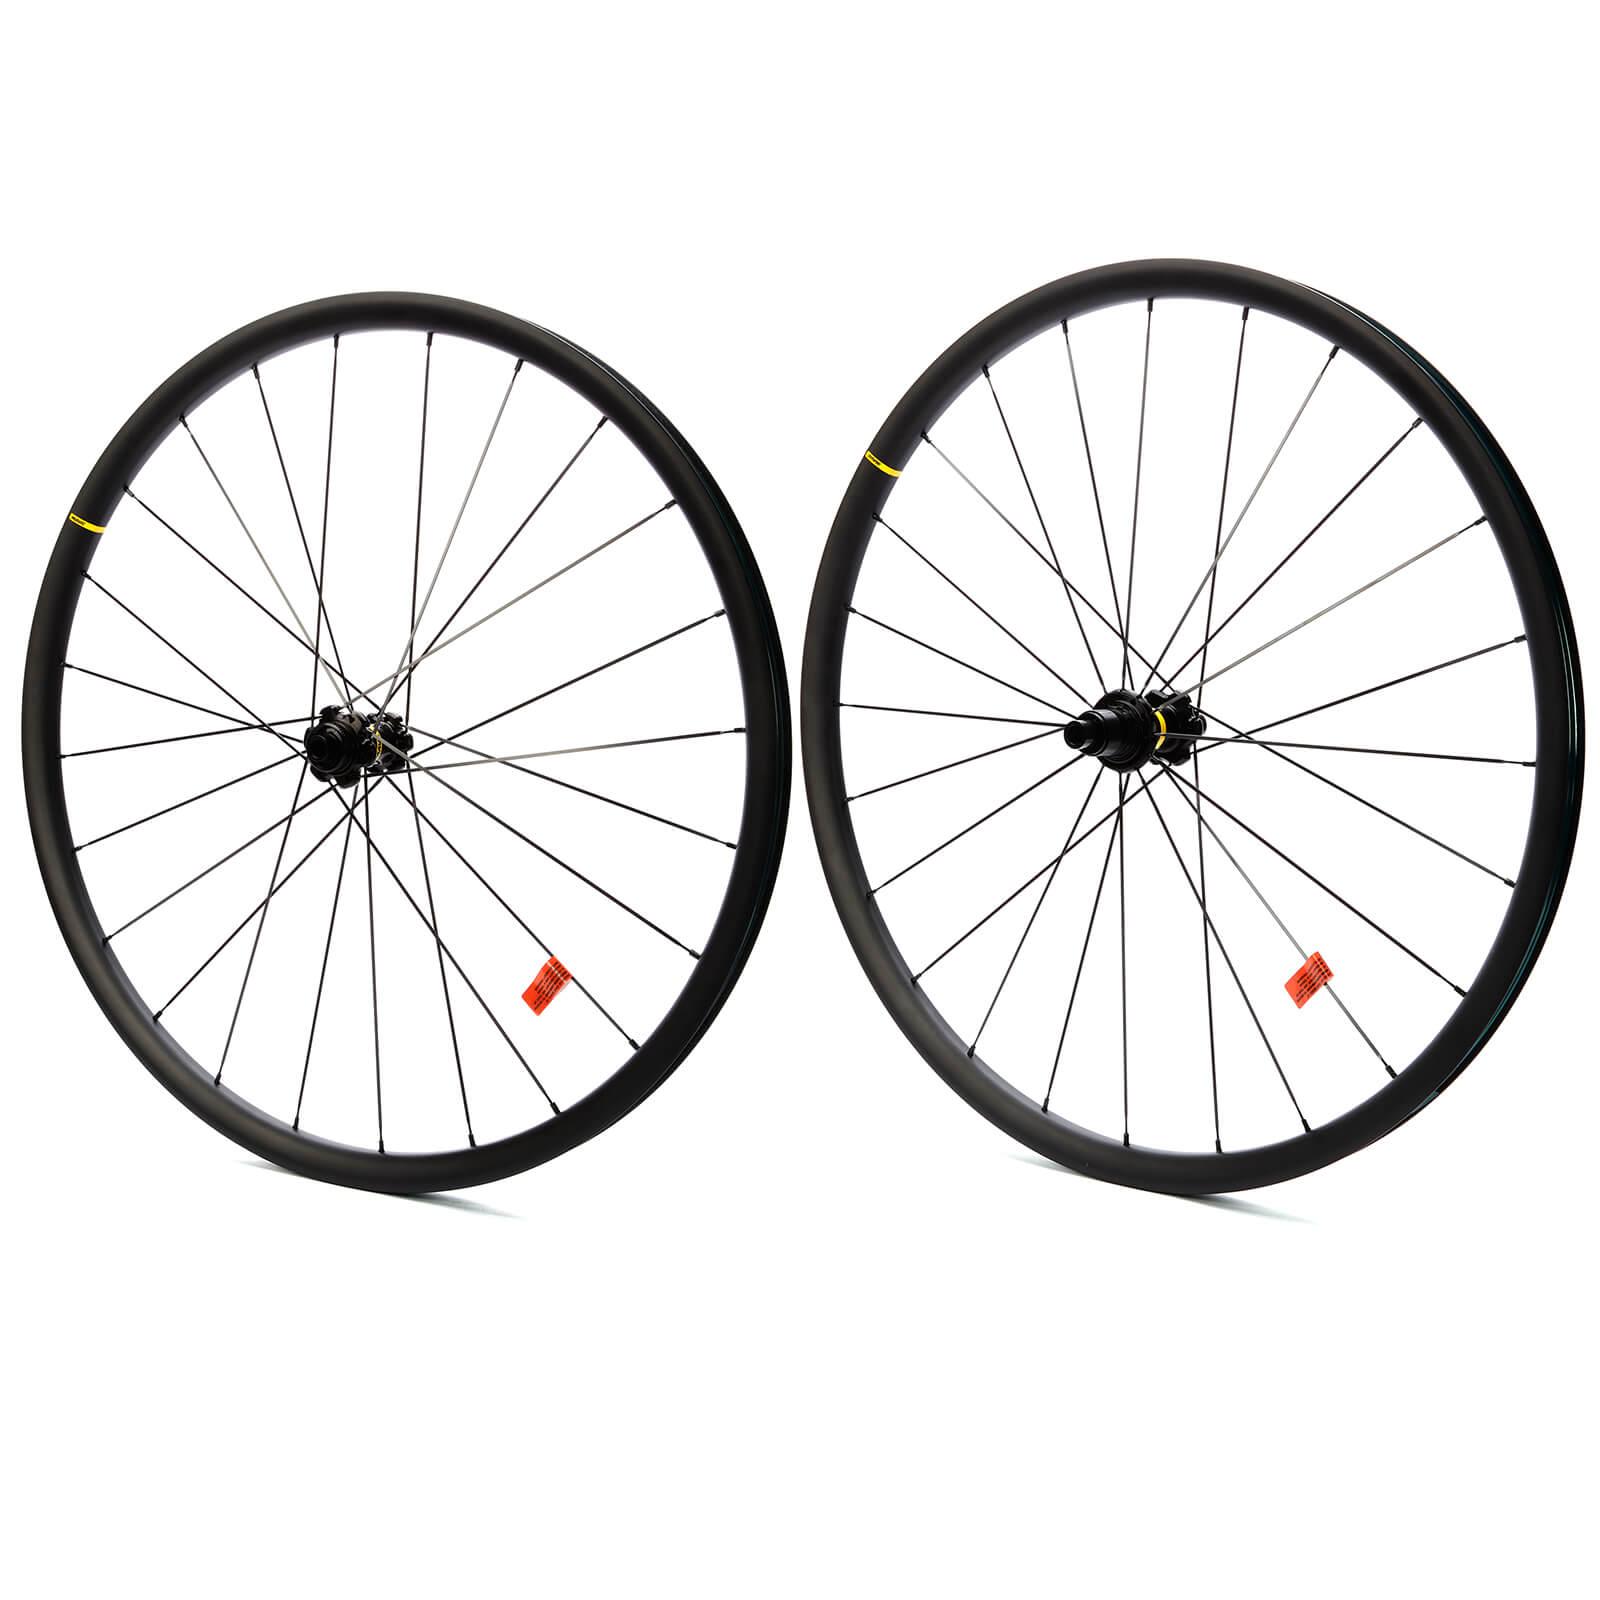 Mavic Allroad Pro Carbon Sl Disc Wheelset - 2021 - Xd-r